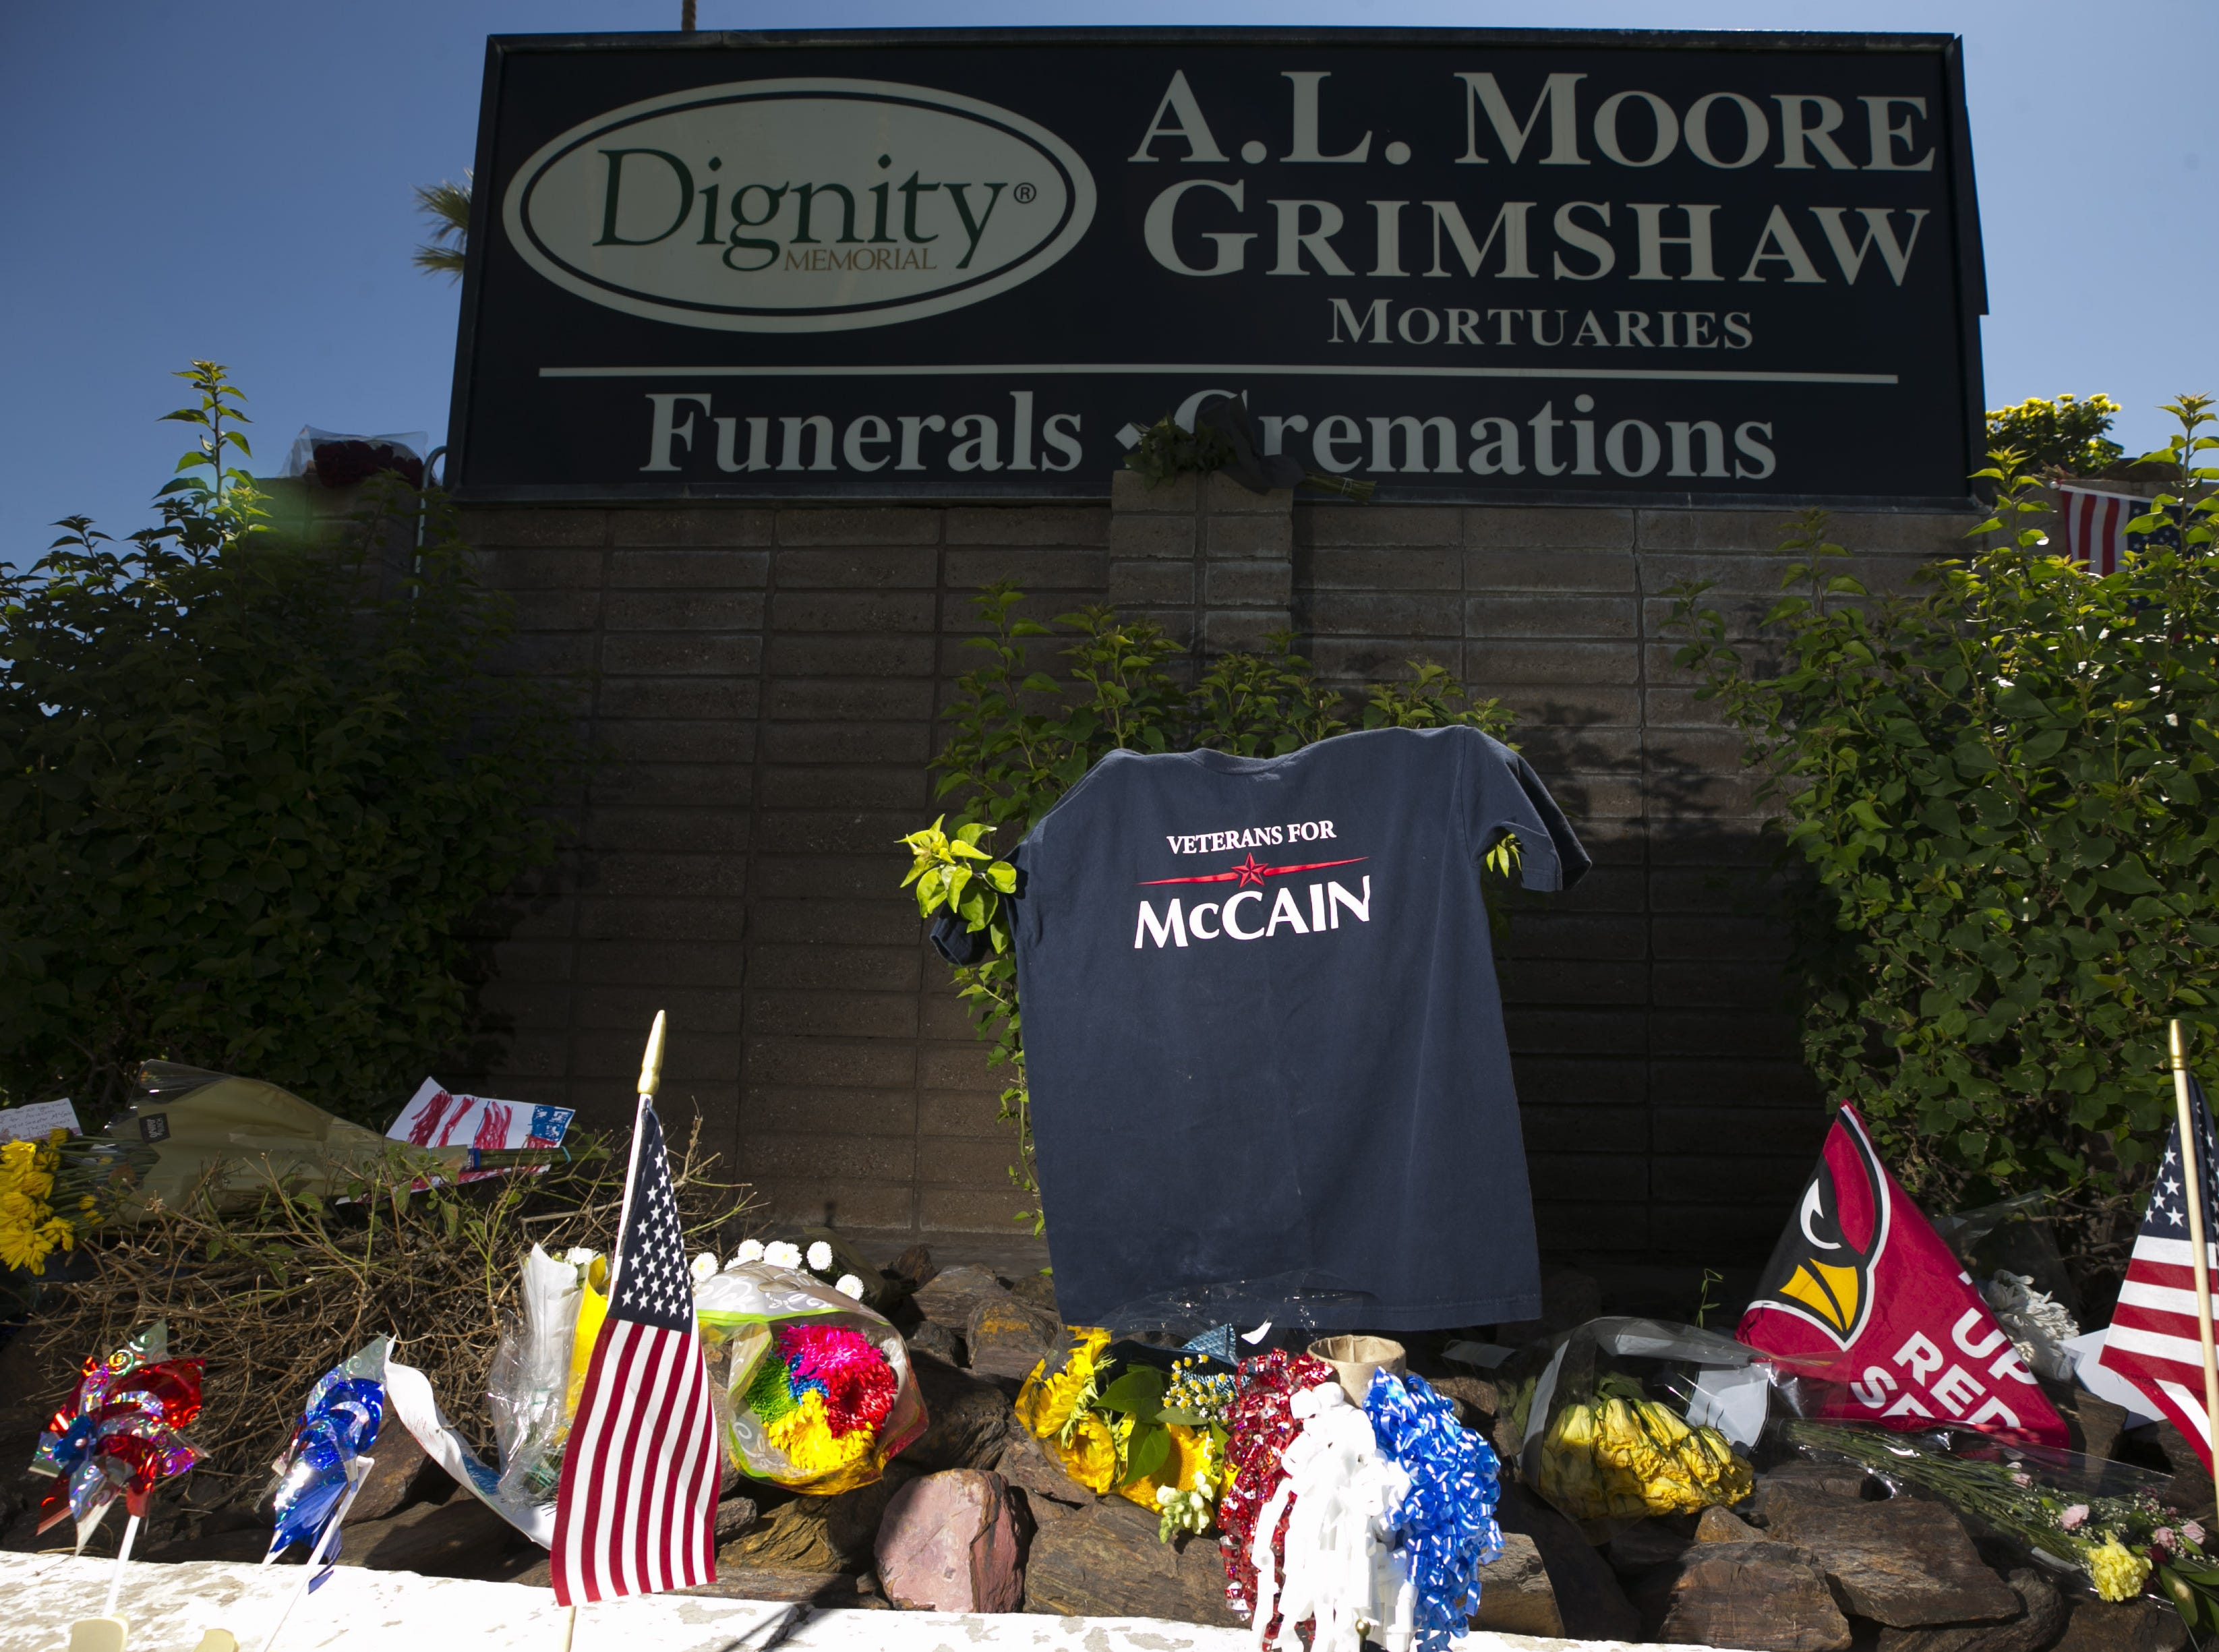 A memorial for Sen. John McCain at A.L. Moore-Grimshaw Mortuaries in Phoenix, on Aug. 27, 2018.